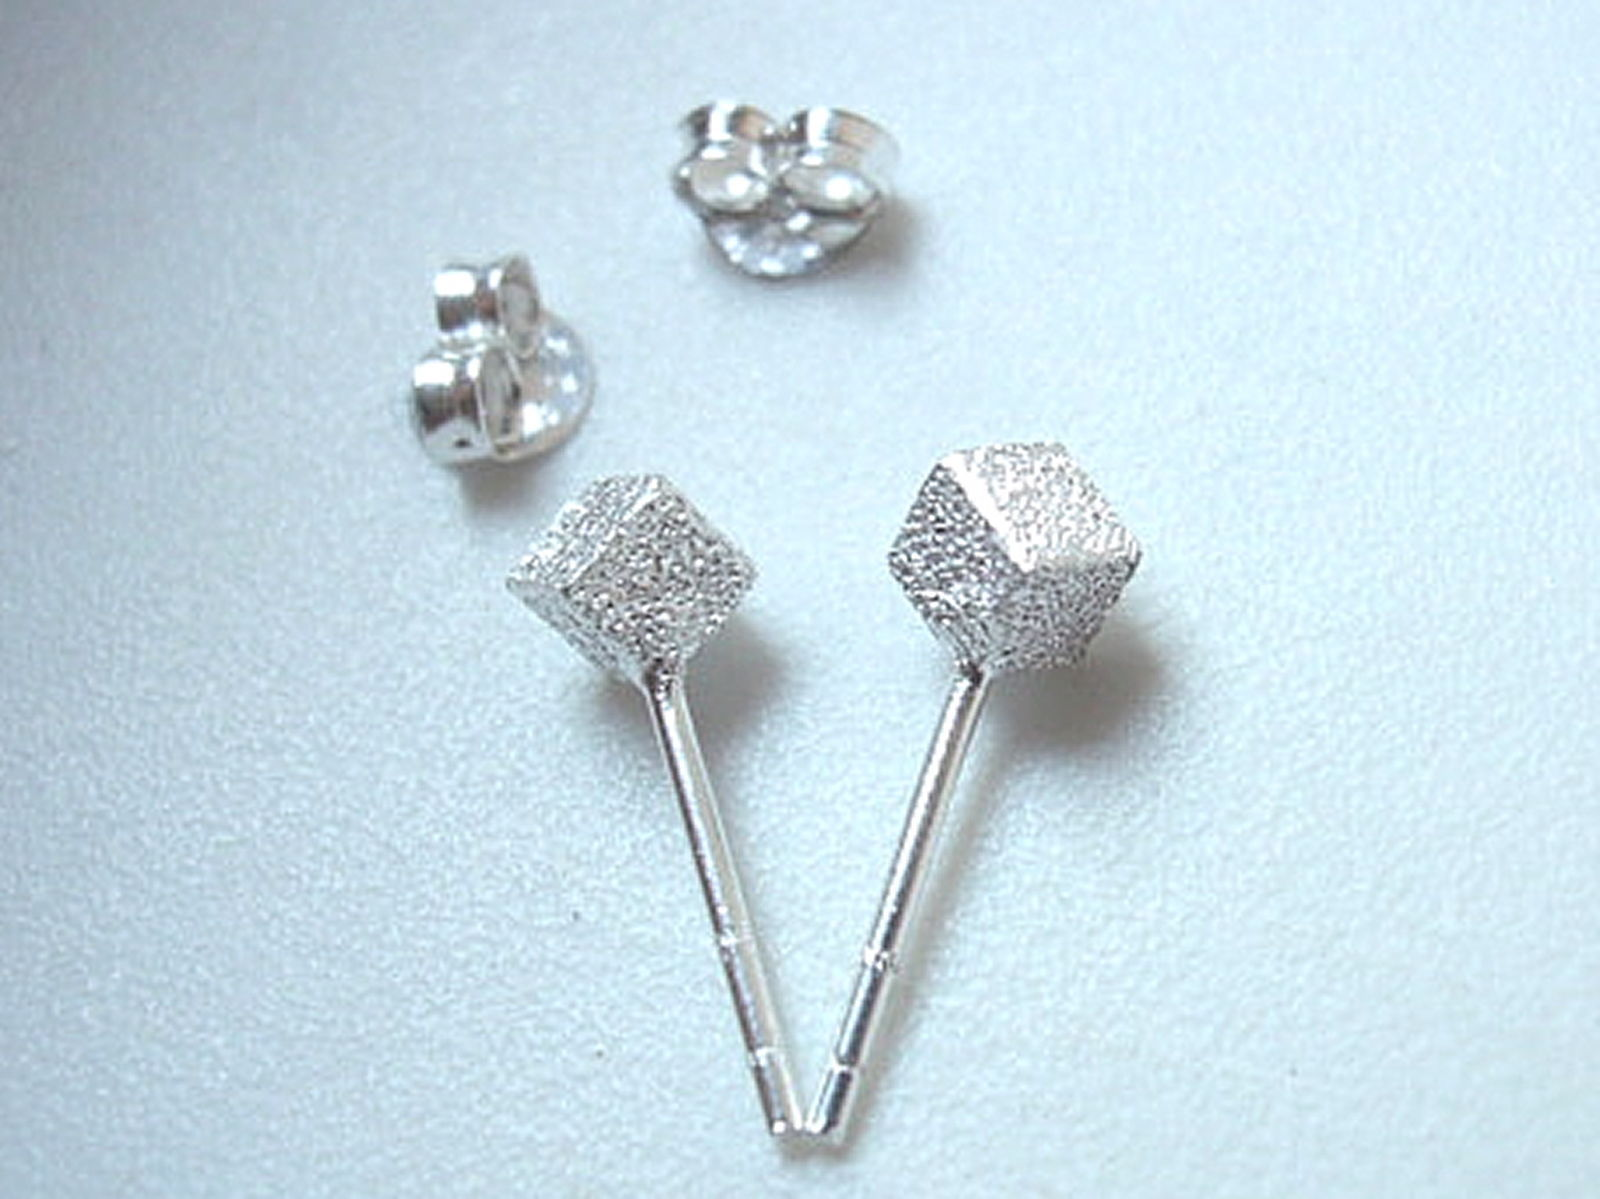 SALE Faux Diamond-Dust 5mm Square Studs 925 Sterling Silver Corona Sun Jewelry - $3.95